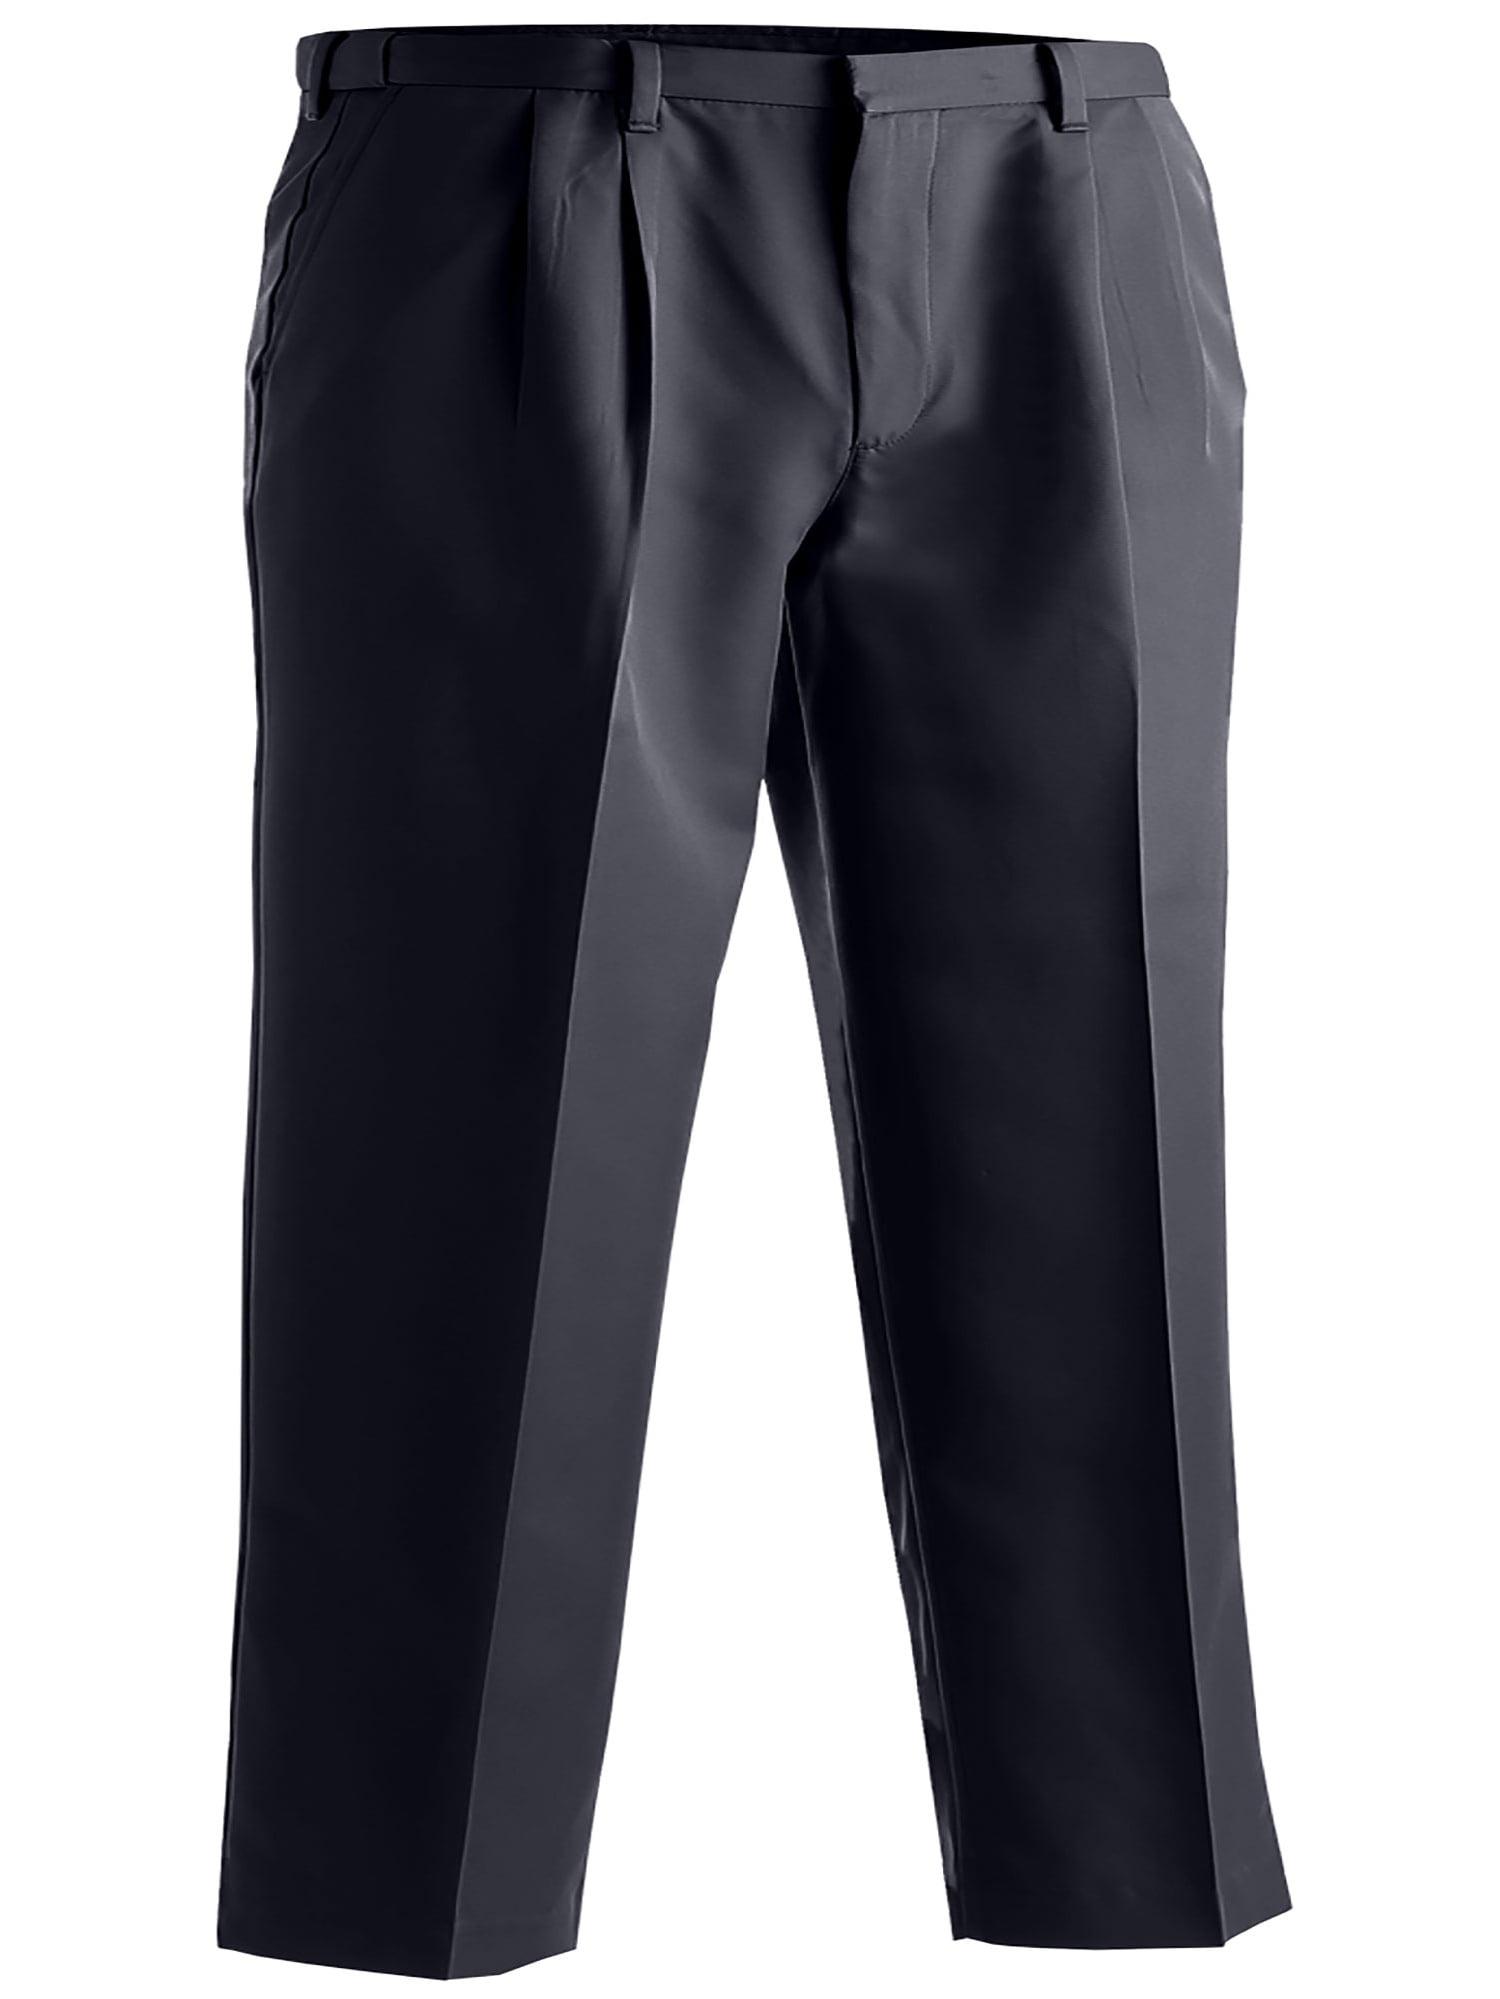 38 Edwards Garments Mens Microfiber Pleated Pant NAVY